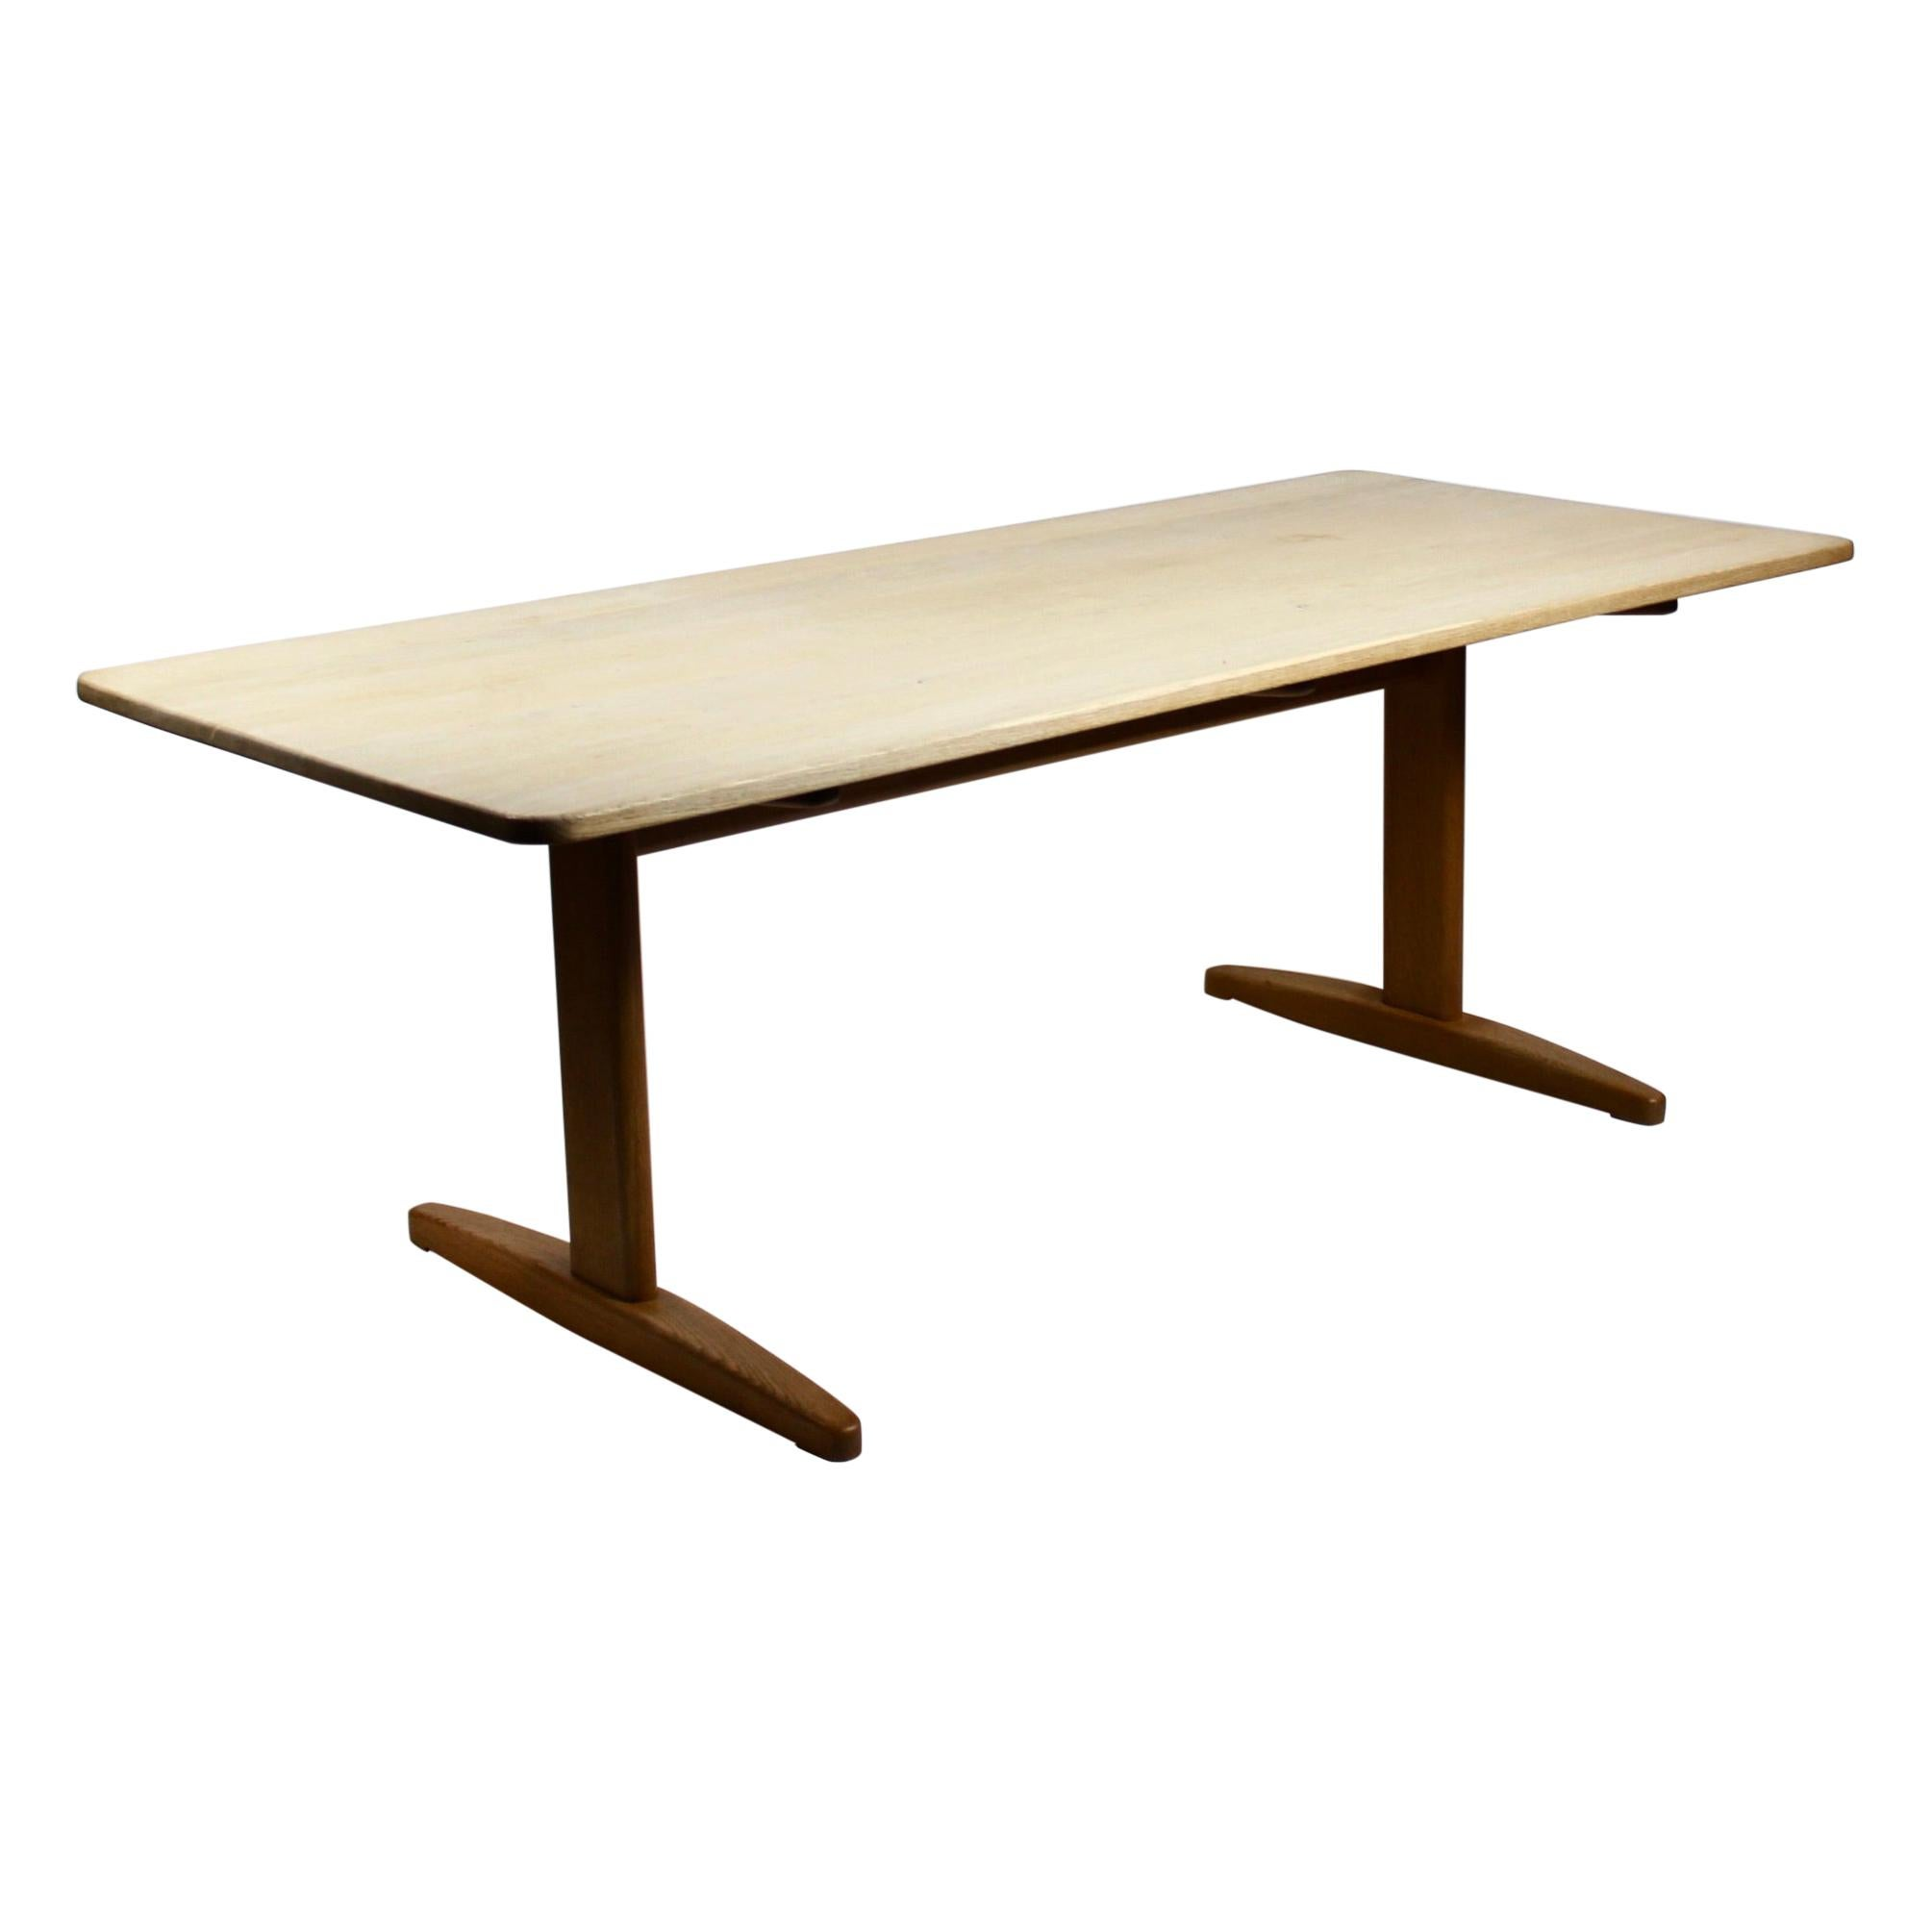 Shaker Dining Table, Model C18, of Soap Treated Oak Designed by Børge Mogensen